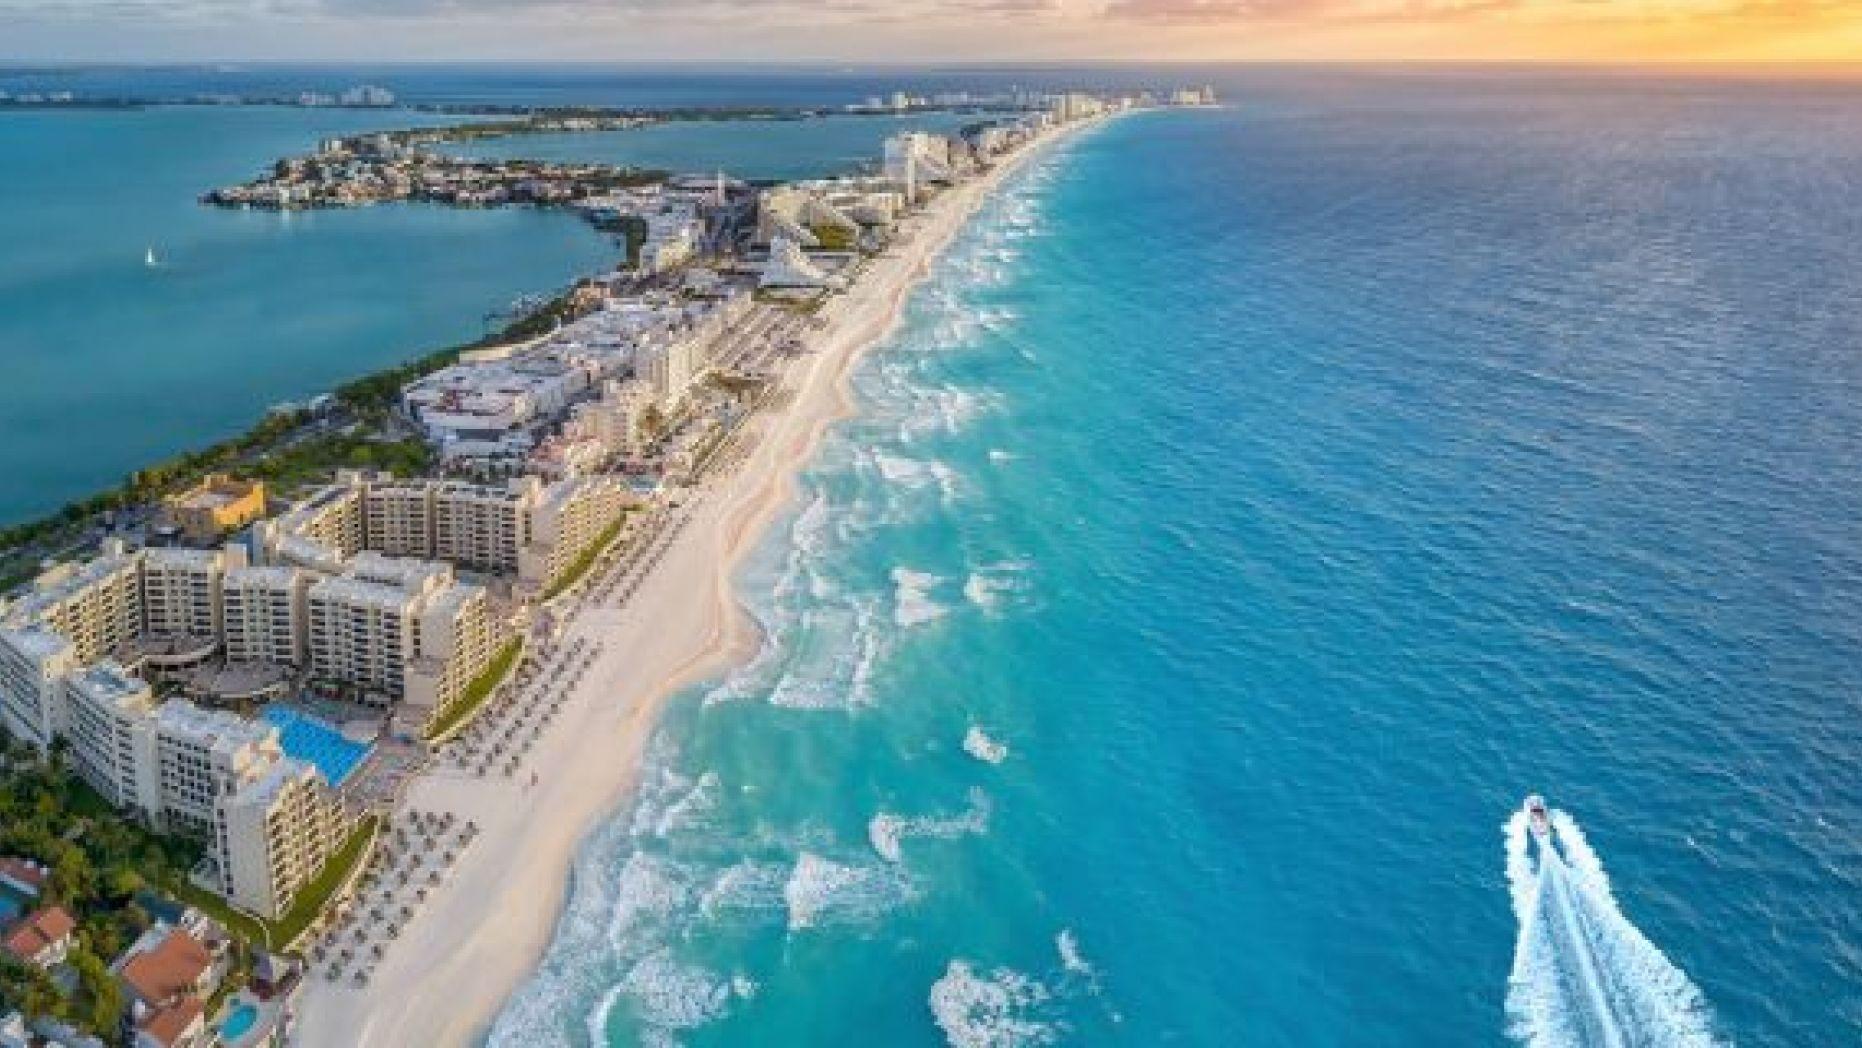 Playa de Cancun Mexico